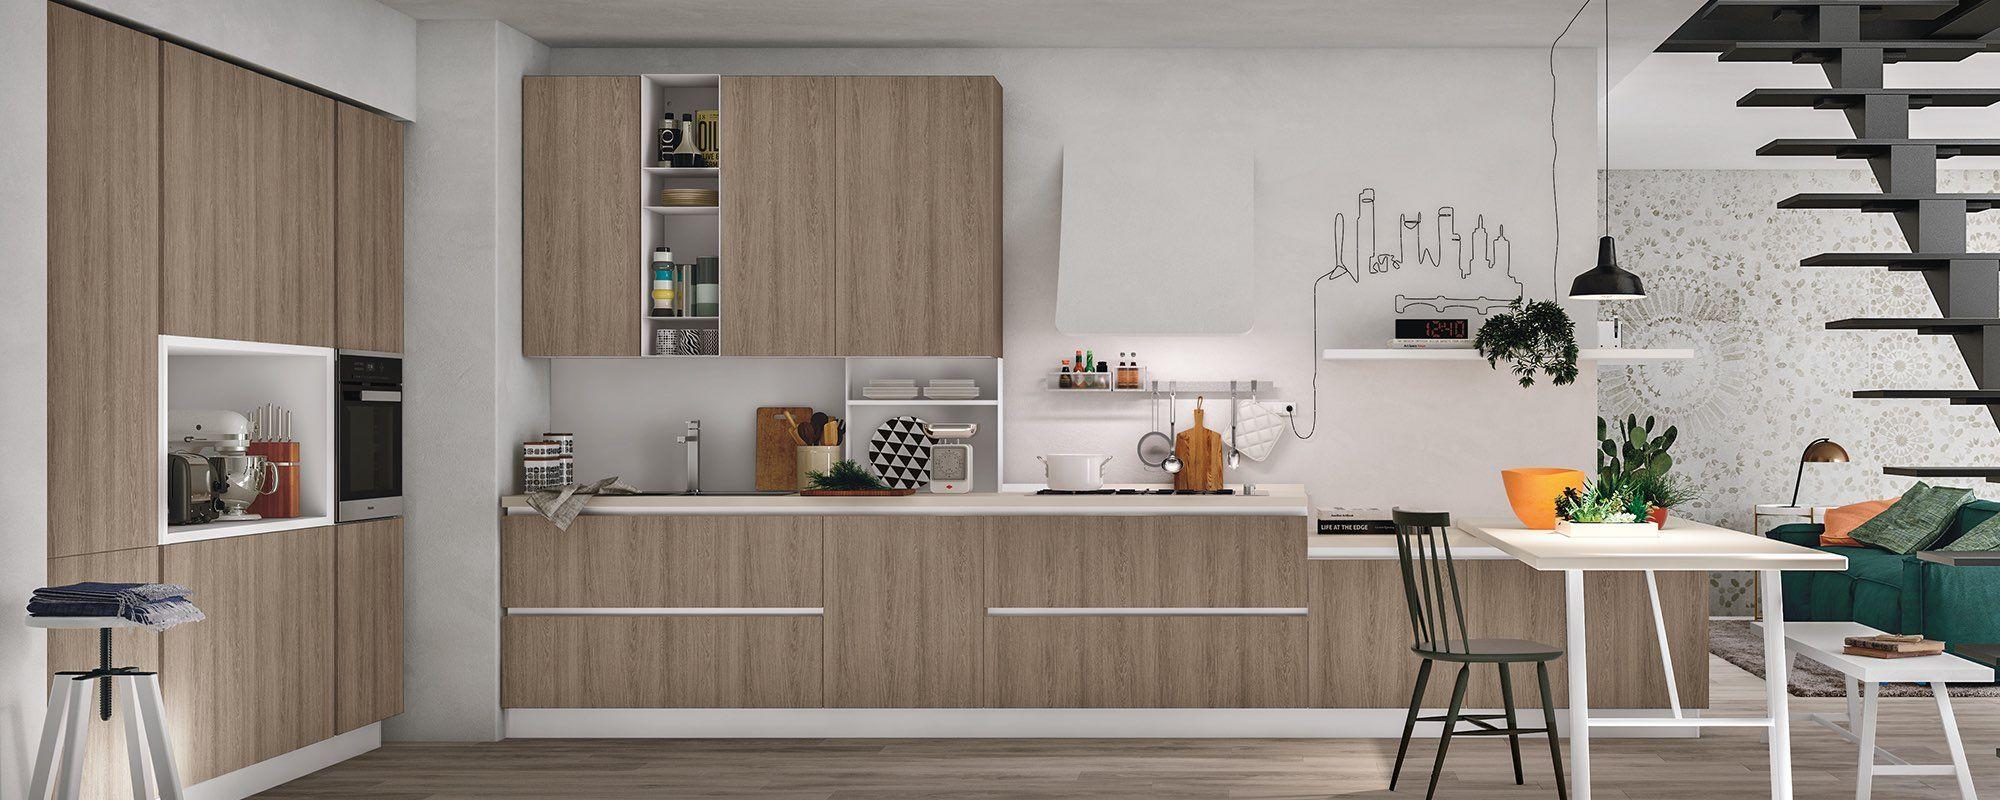 arredamentifelicepalma #felicepalma #arredamenti #cucina #rewind ... - Cucine Moderne Penisola